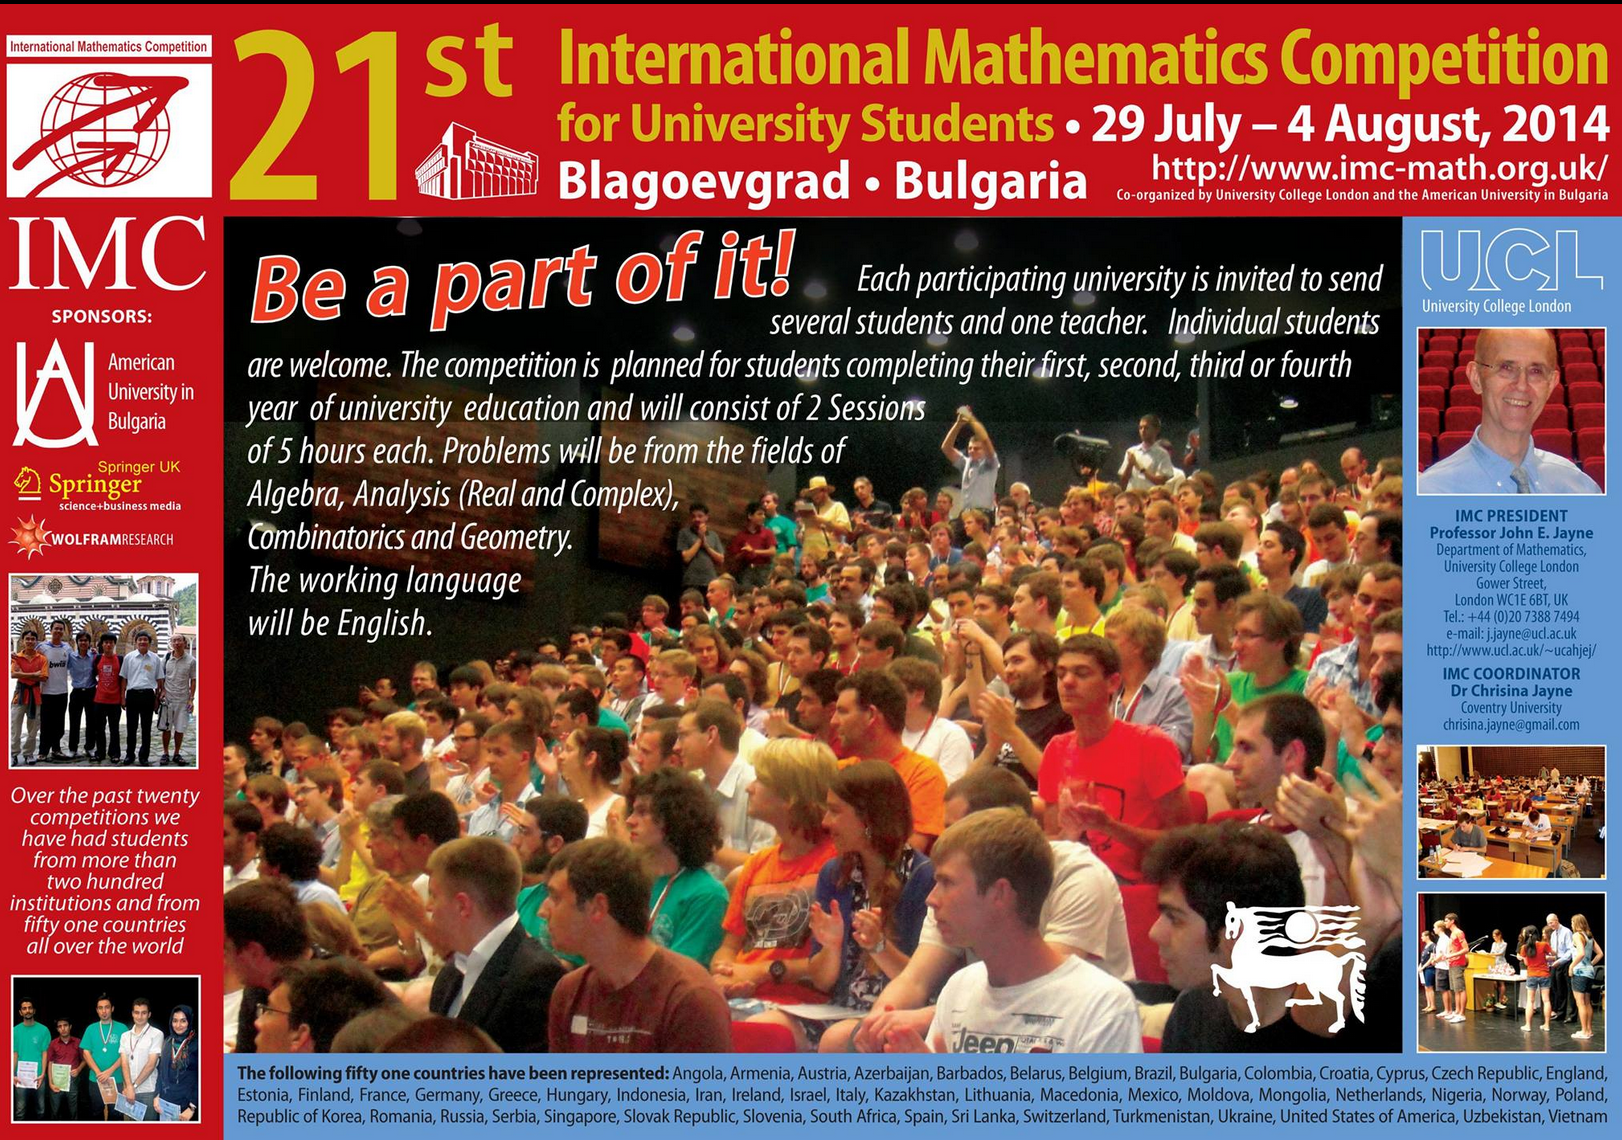 IMC - International Mathematics Competition for University Students